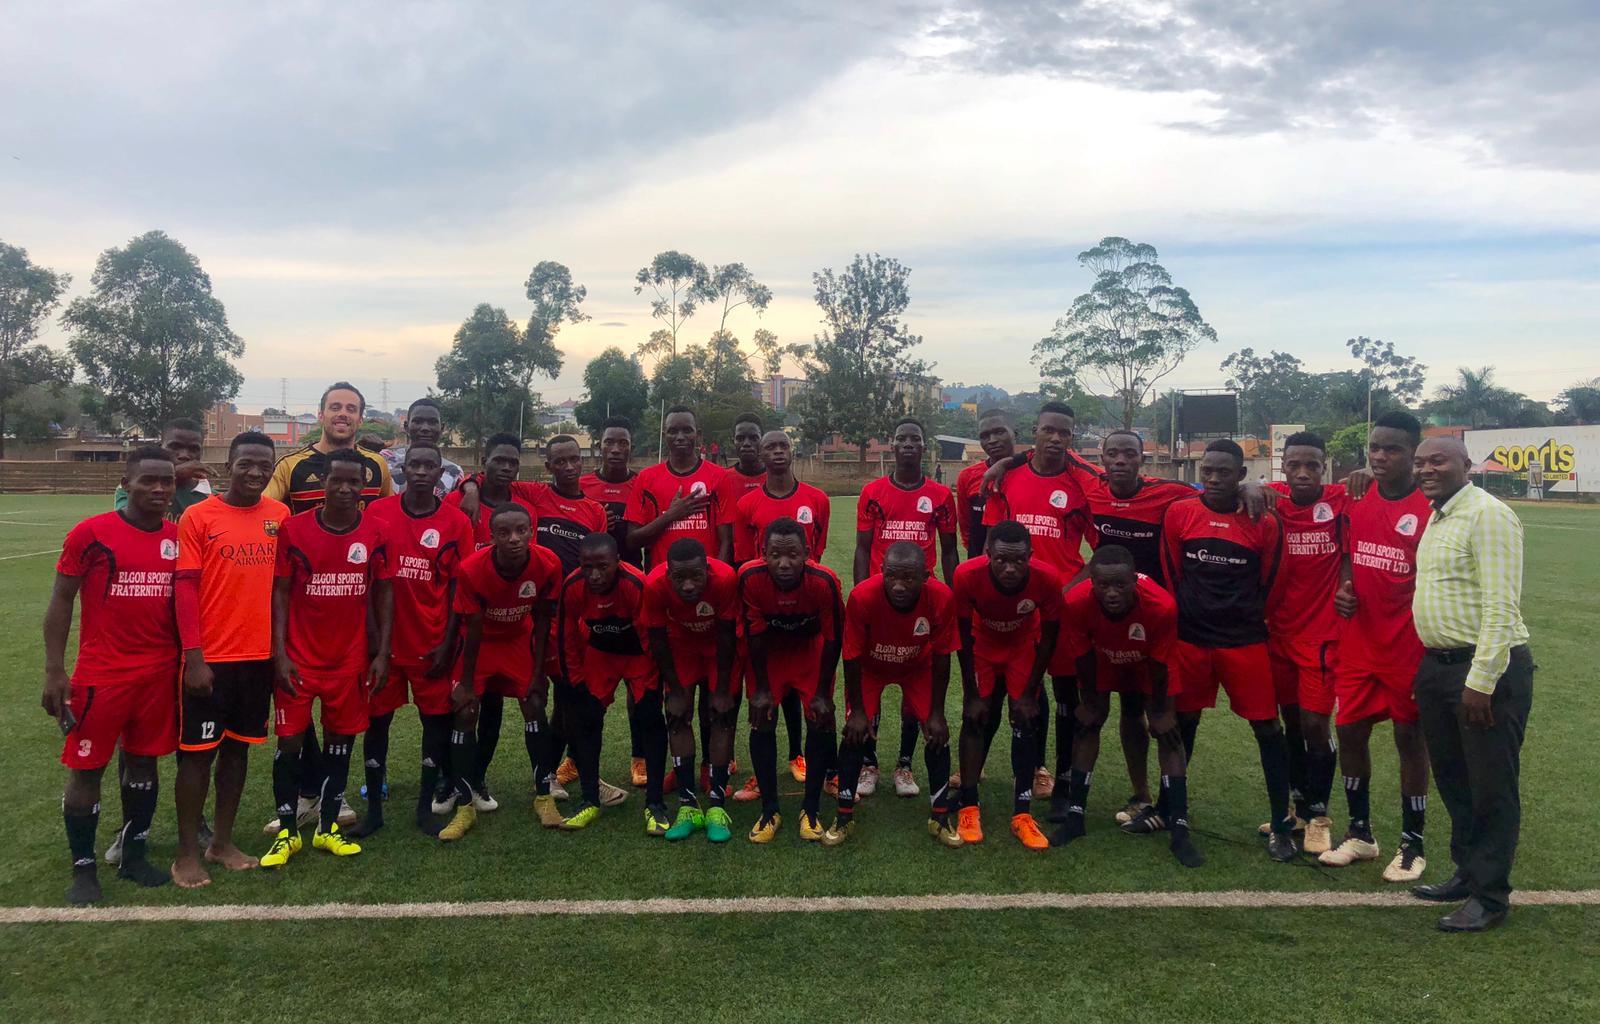 BJL Fontes Football Club